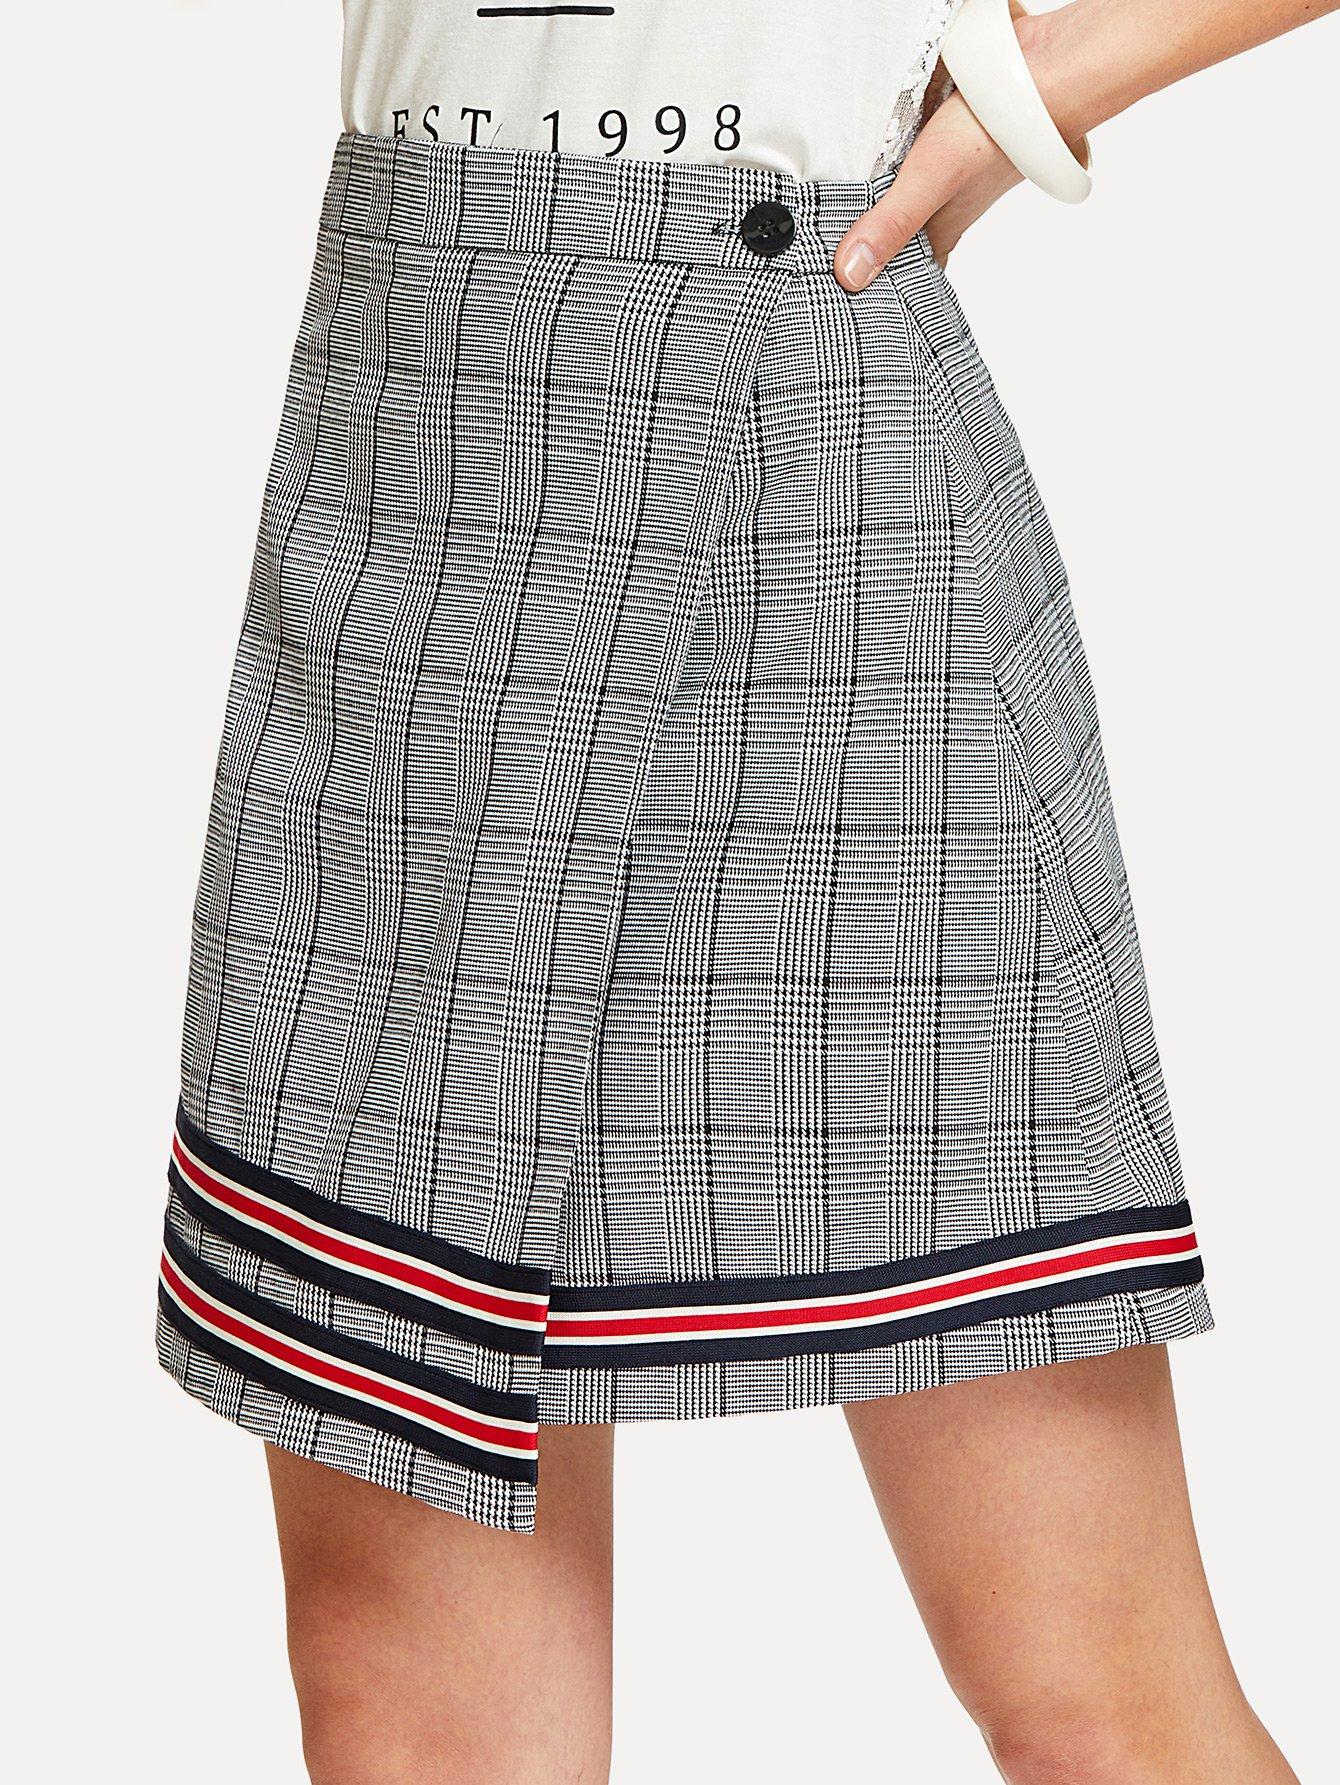 Striped Tape Detail Plaid Skirt striped woven tape detail two tone sweatshirt